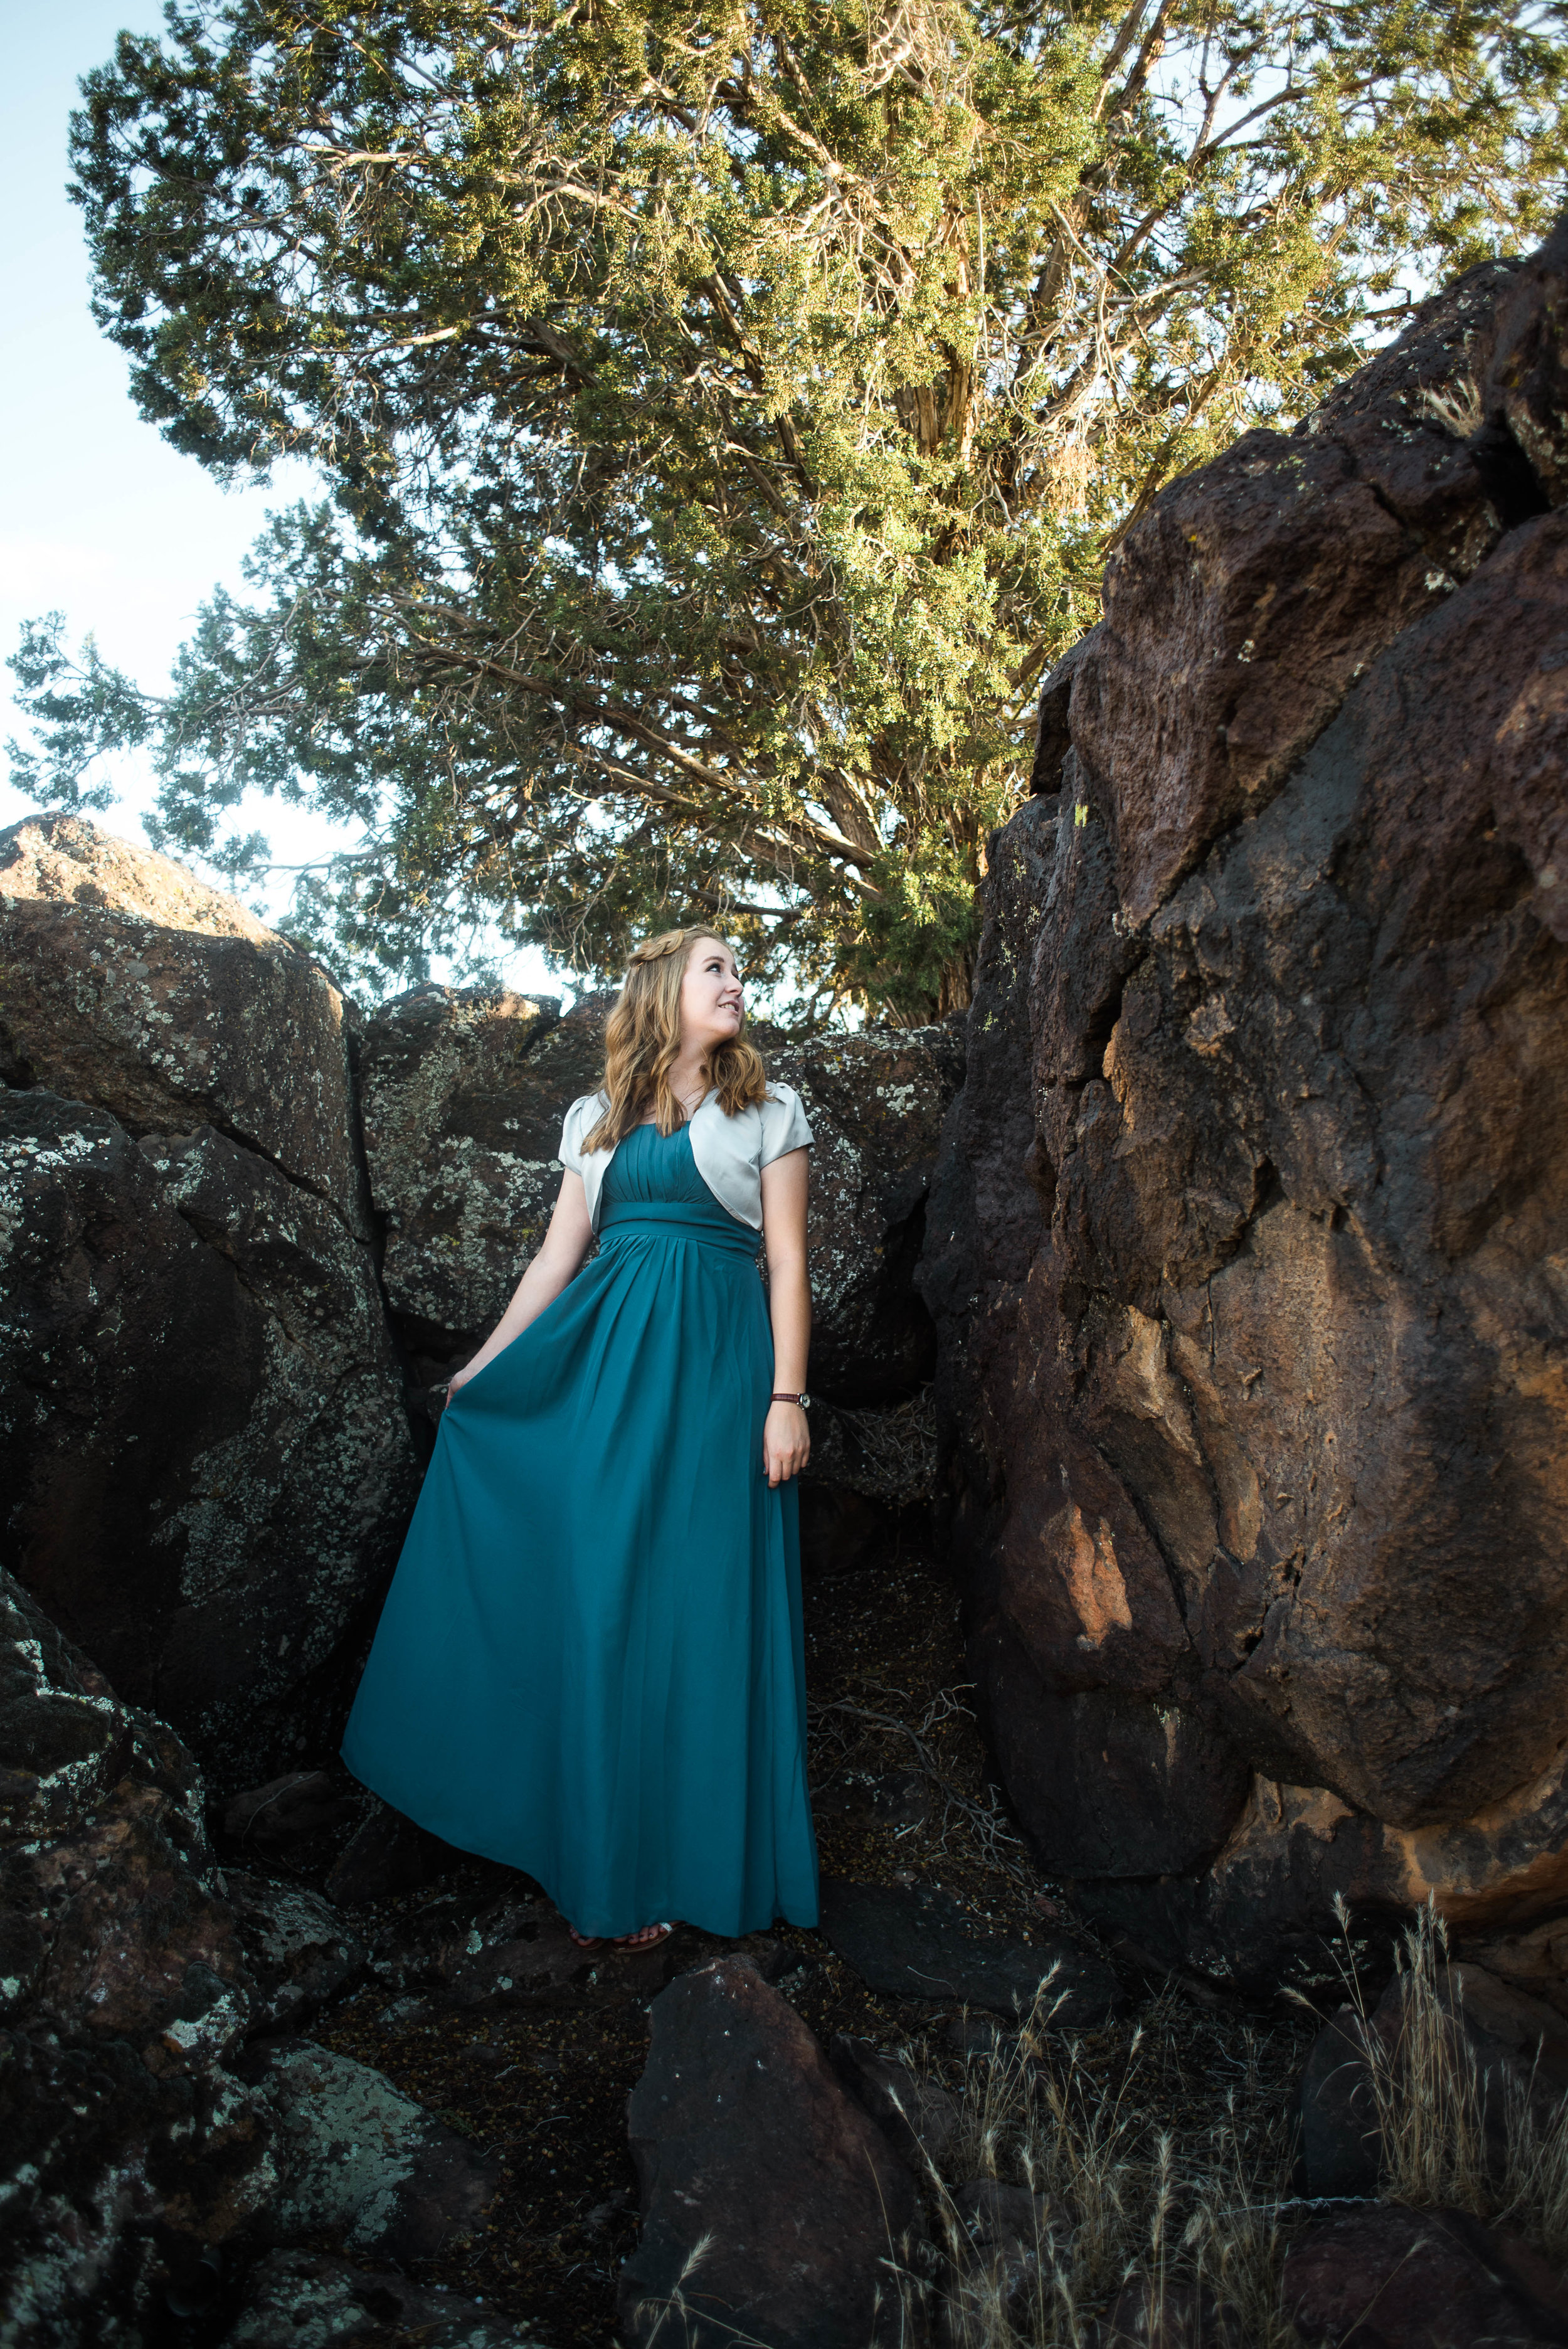 SENIOR-REP-RETREAT-DAY-2-Sadie_Banks_Photography-35.jpg